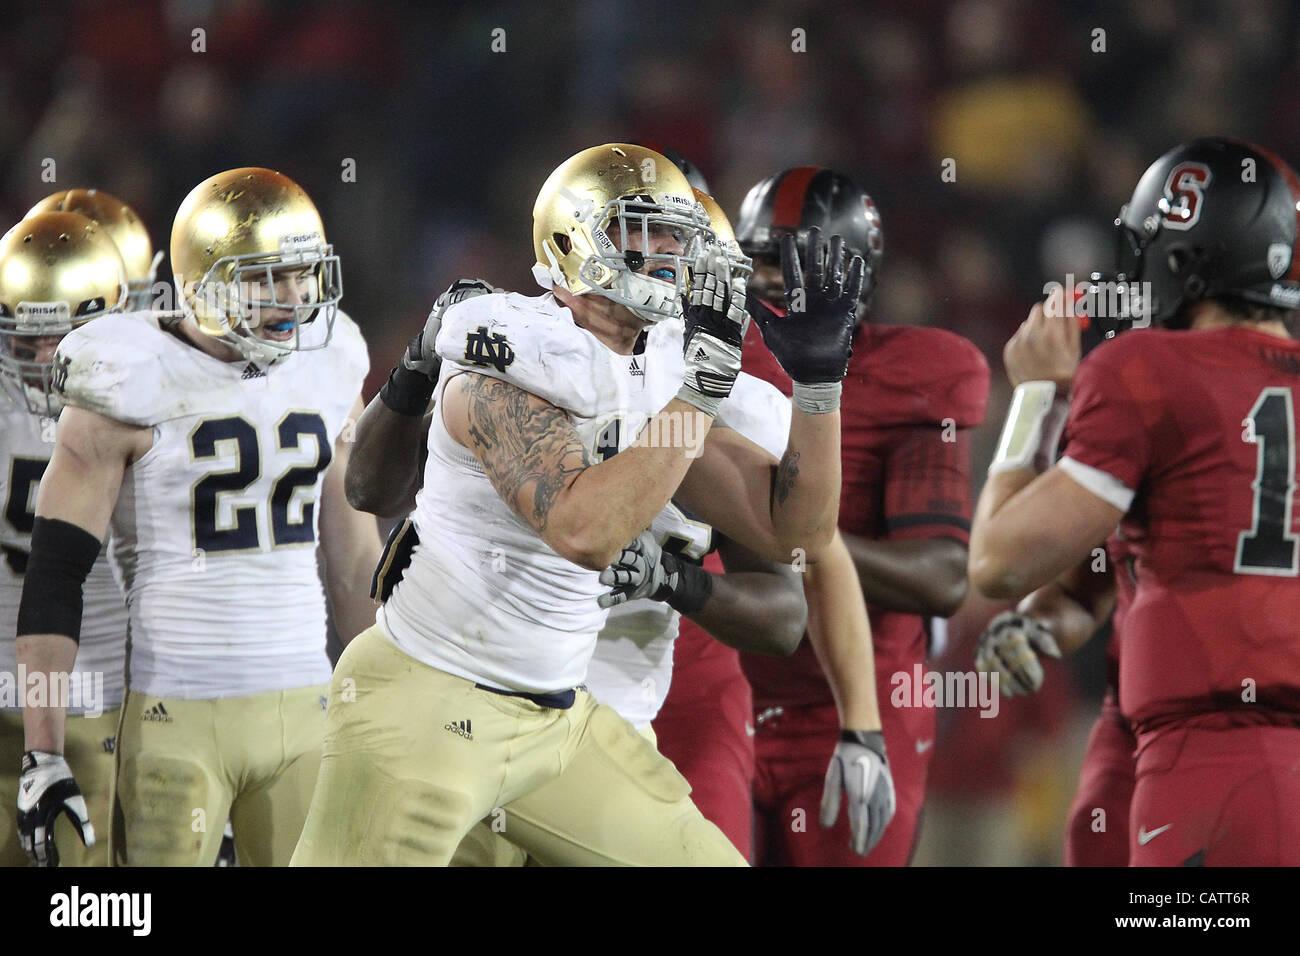 Nov. 26, 2011 - Palo Alto, California, USA - Notre Dame's Aaron Lynch (19). The Notre Dame Fighting Irish was dominated Stock Photo